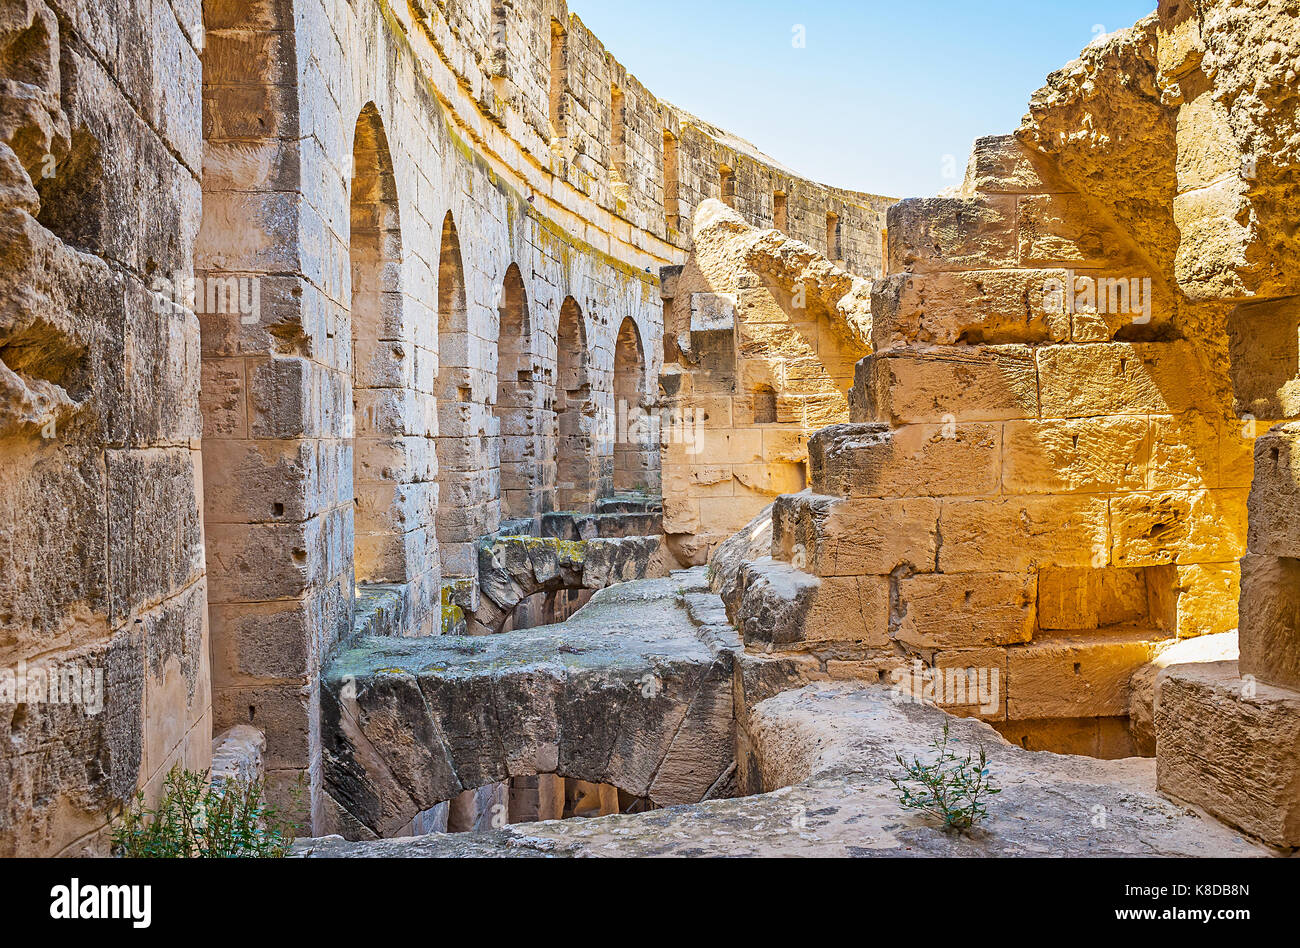 EL DJEM, TUNISIA - SEPTEMBER 1, 2015: The walk along the ruins of portico of El Jem amphitheater, on September 1 - Stock Image